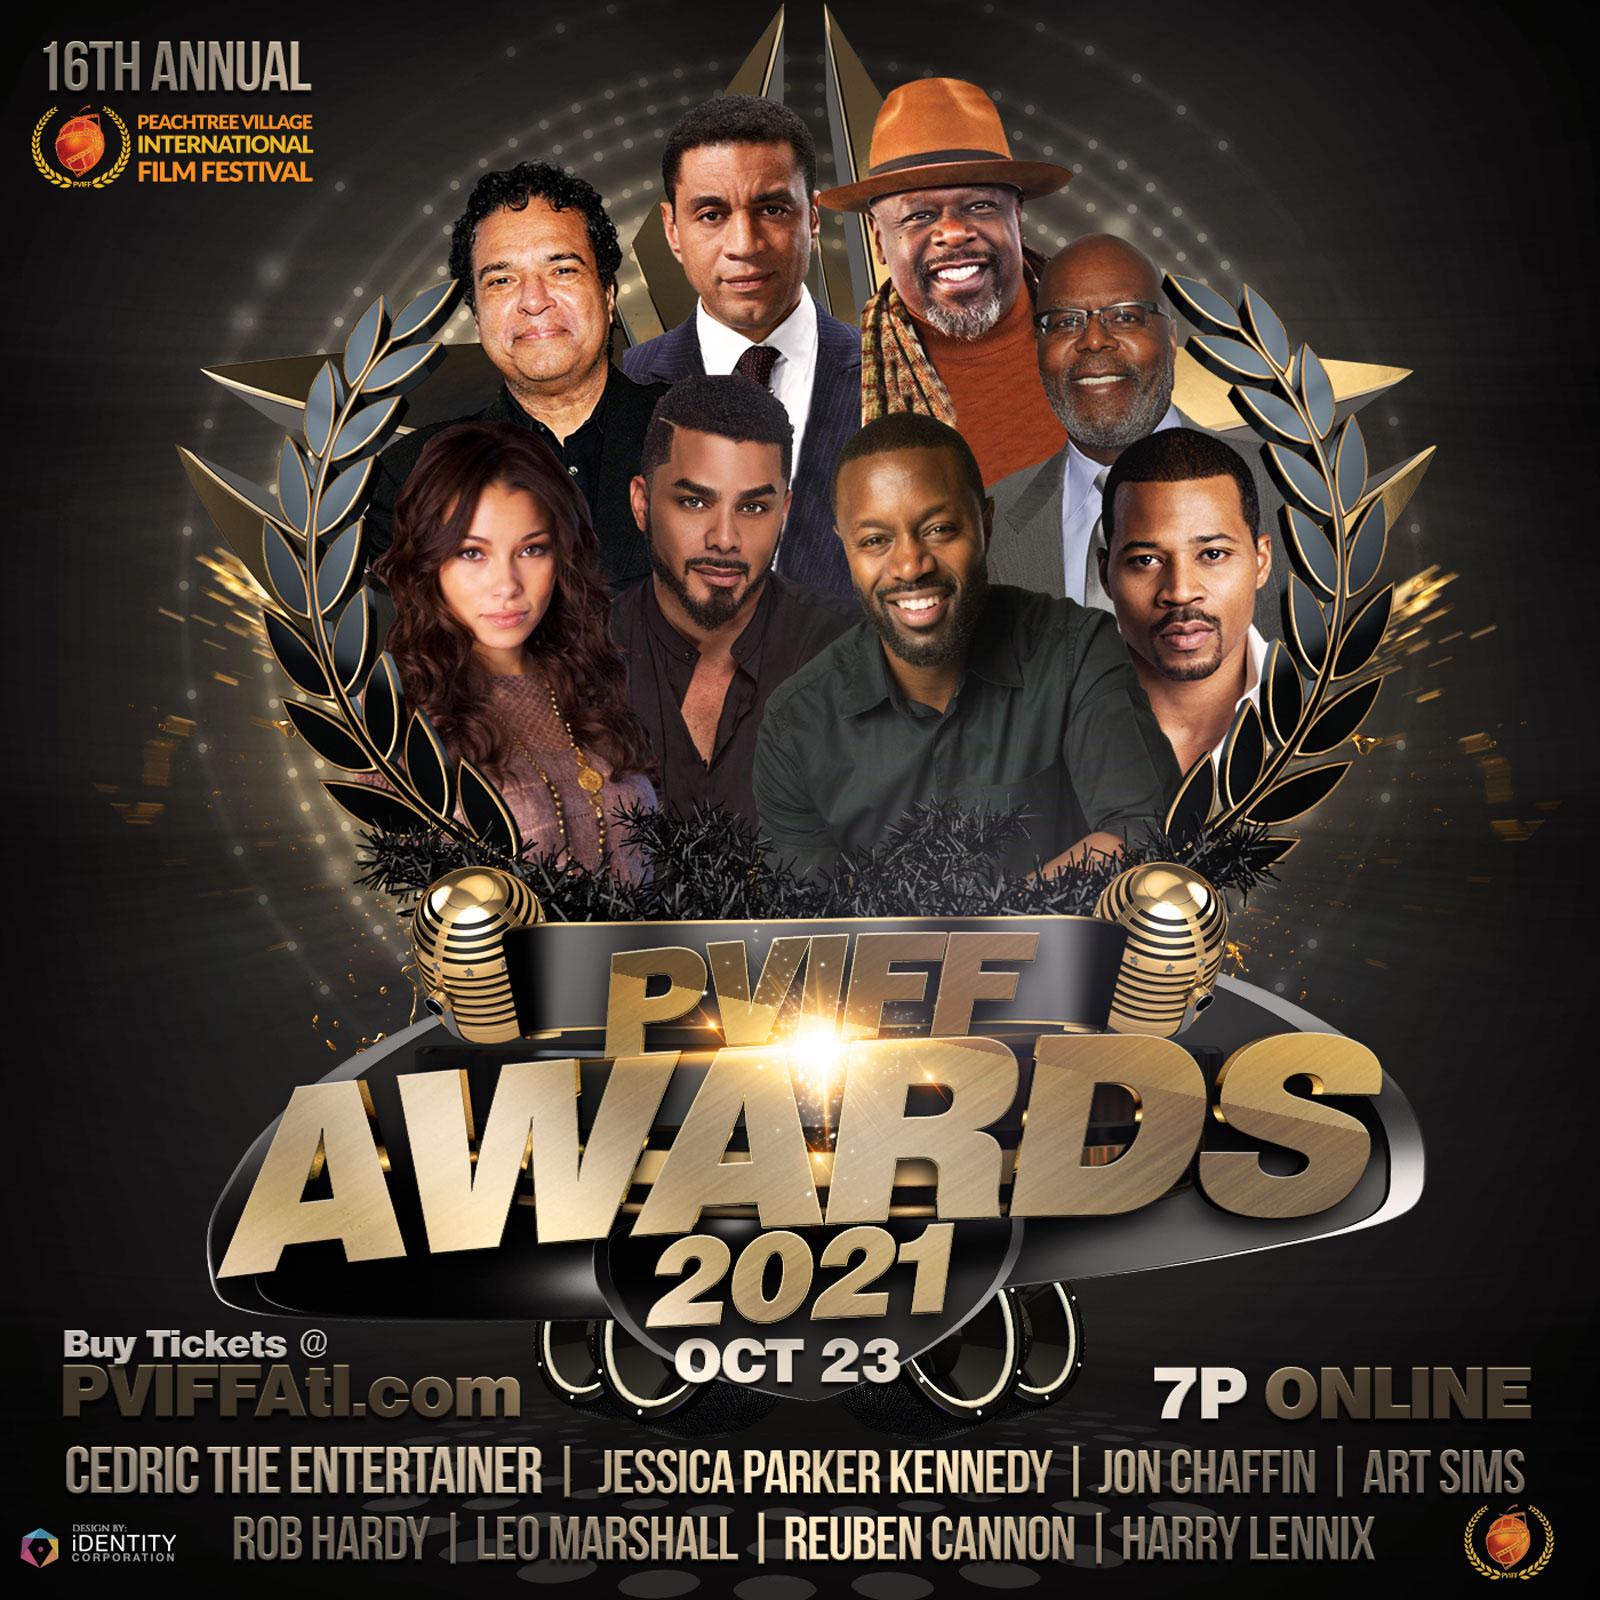 pviff-awards-2021